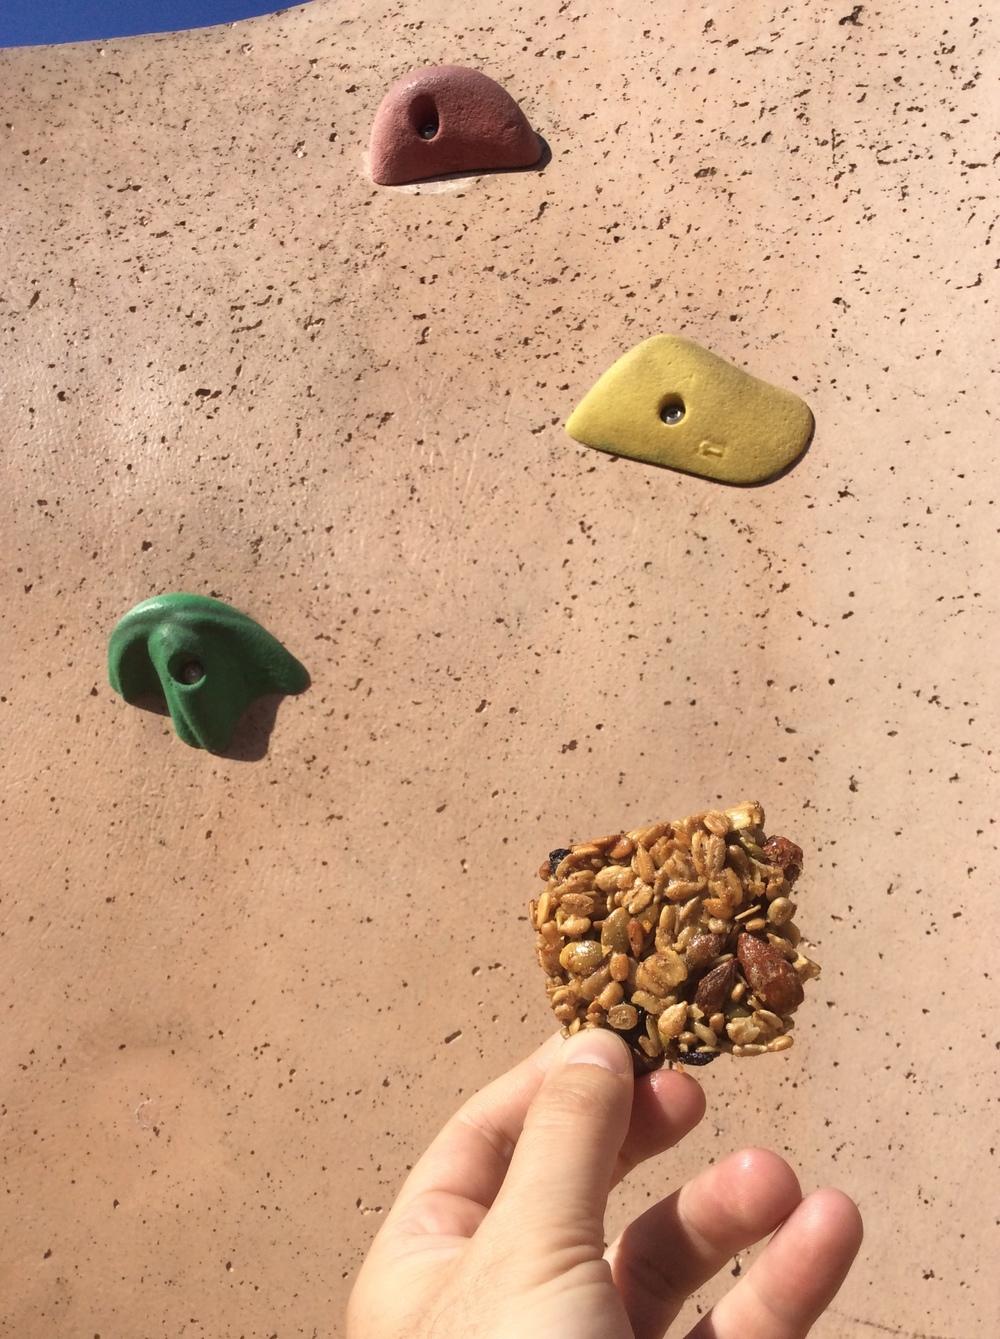 Hi-FiBar Lemon Zest Blueberry Snack Bar (seasonal) - perfect power for climbing the wall